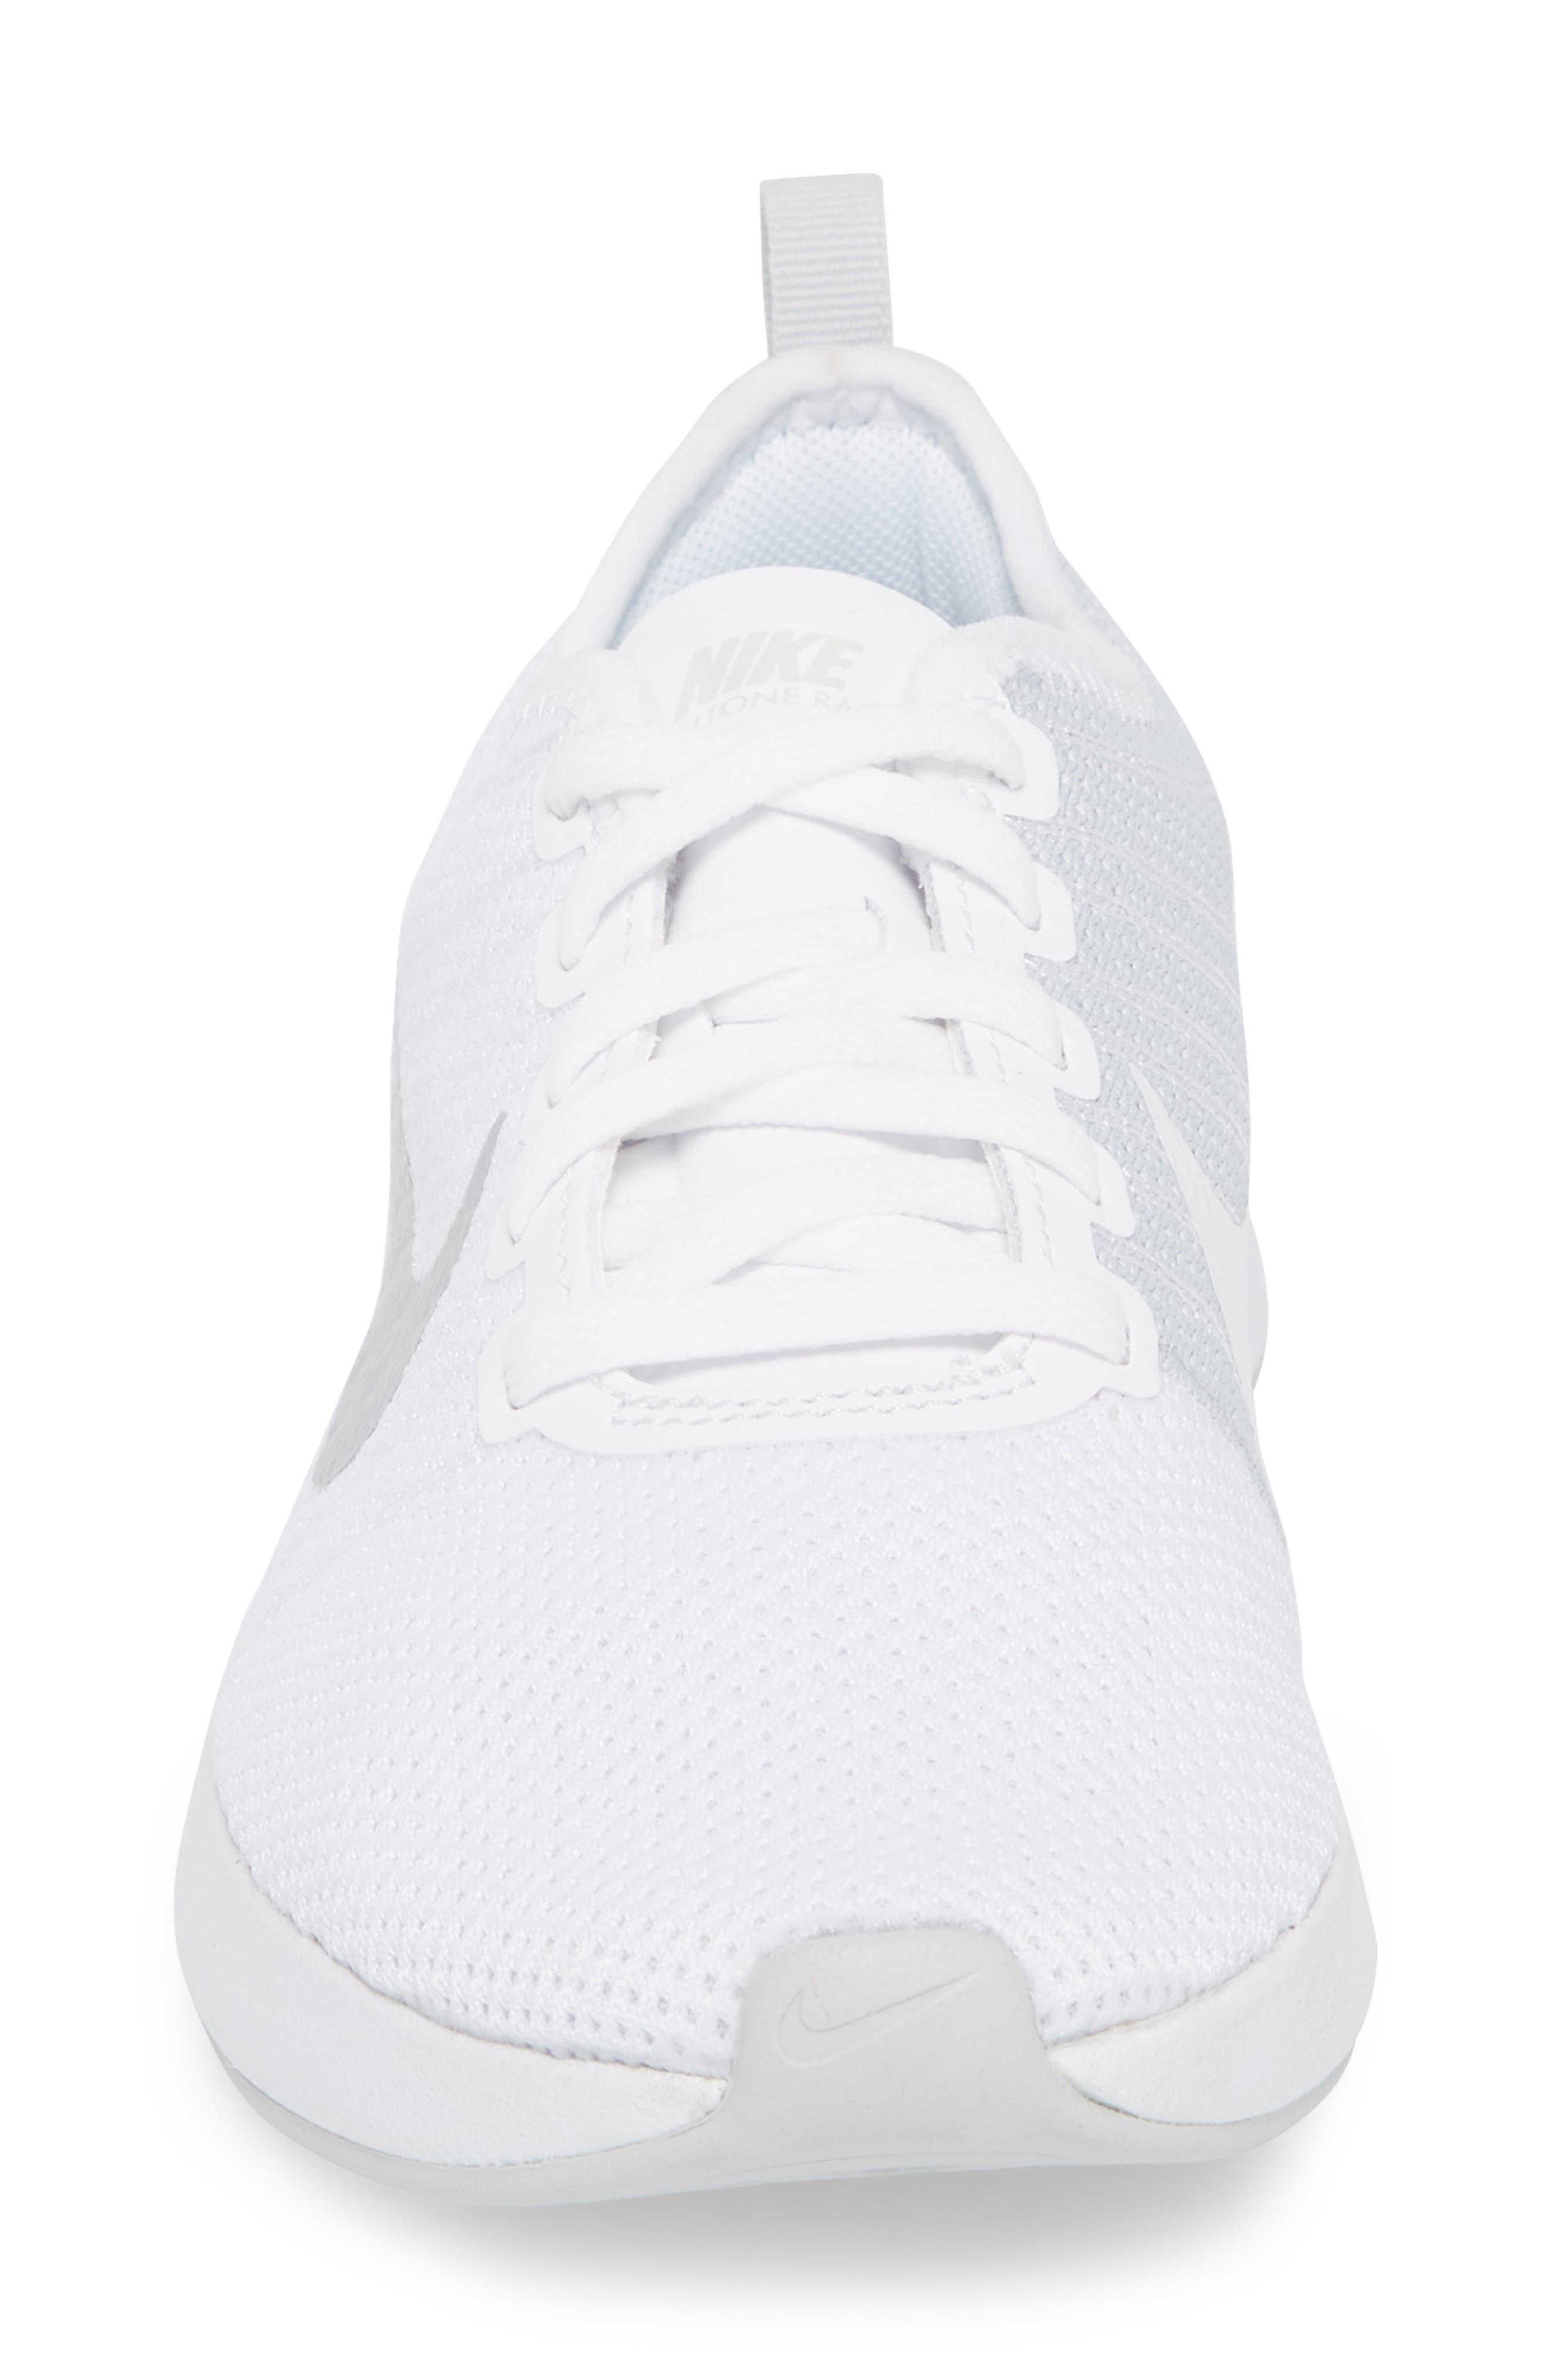 Dualtone Racer Running Shoe,                             Alternate thumbnail 4, color,                             White/ Pure Platinum